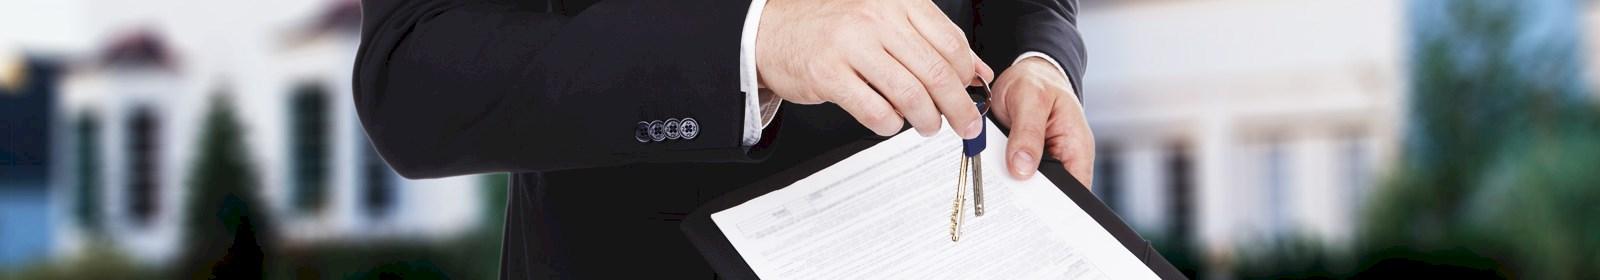 The property registration process